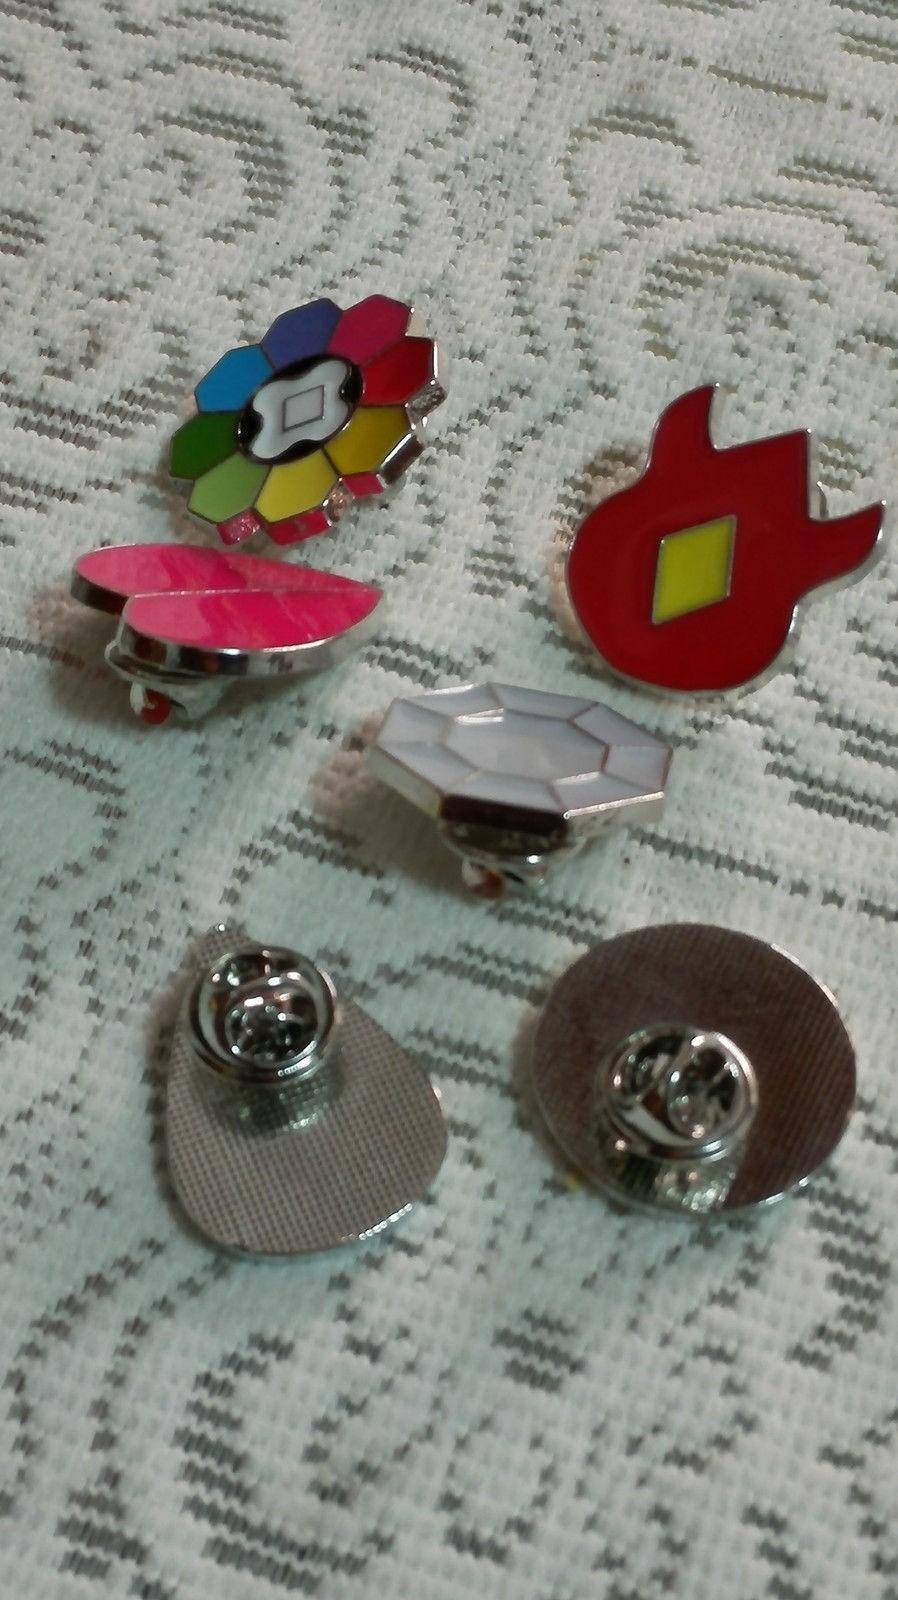 Cep Canavar Pokemon Kanto 8 Metal Lig Rozeti Pin Pip Gen Krmz Sablon Thailand 12mm Cosplay Prop Koleksiyonu Set Rozetleri Kutu 1216 Cm